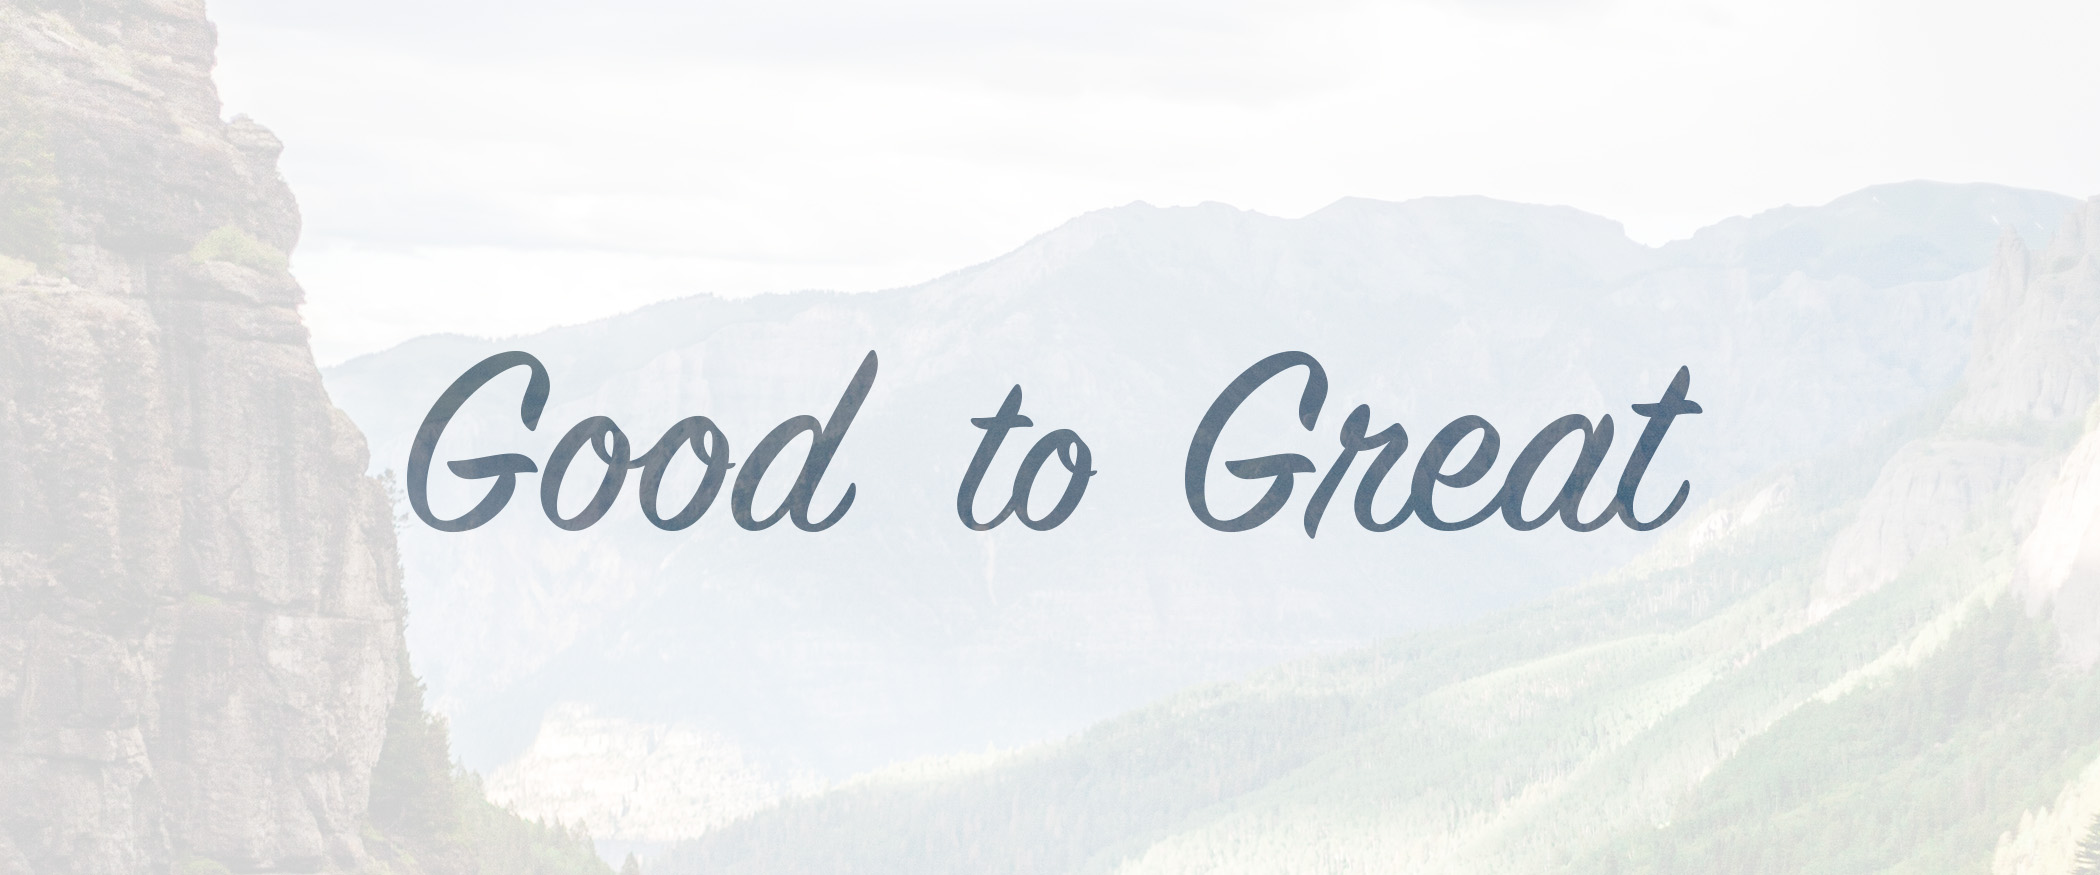 good_great_slide